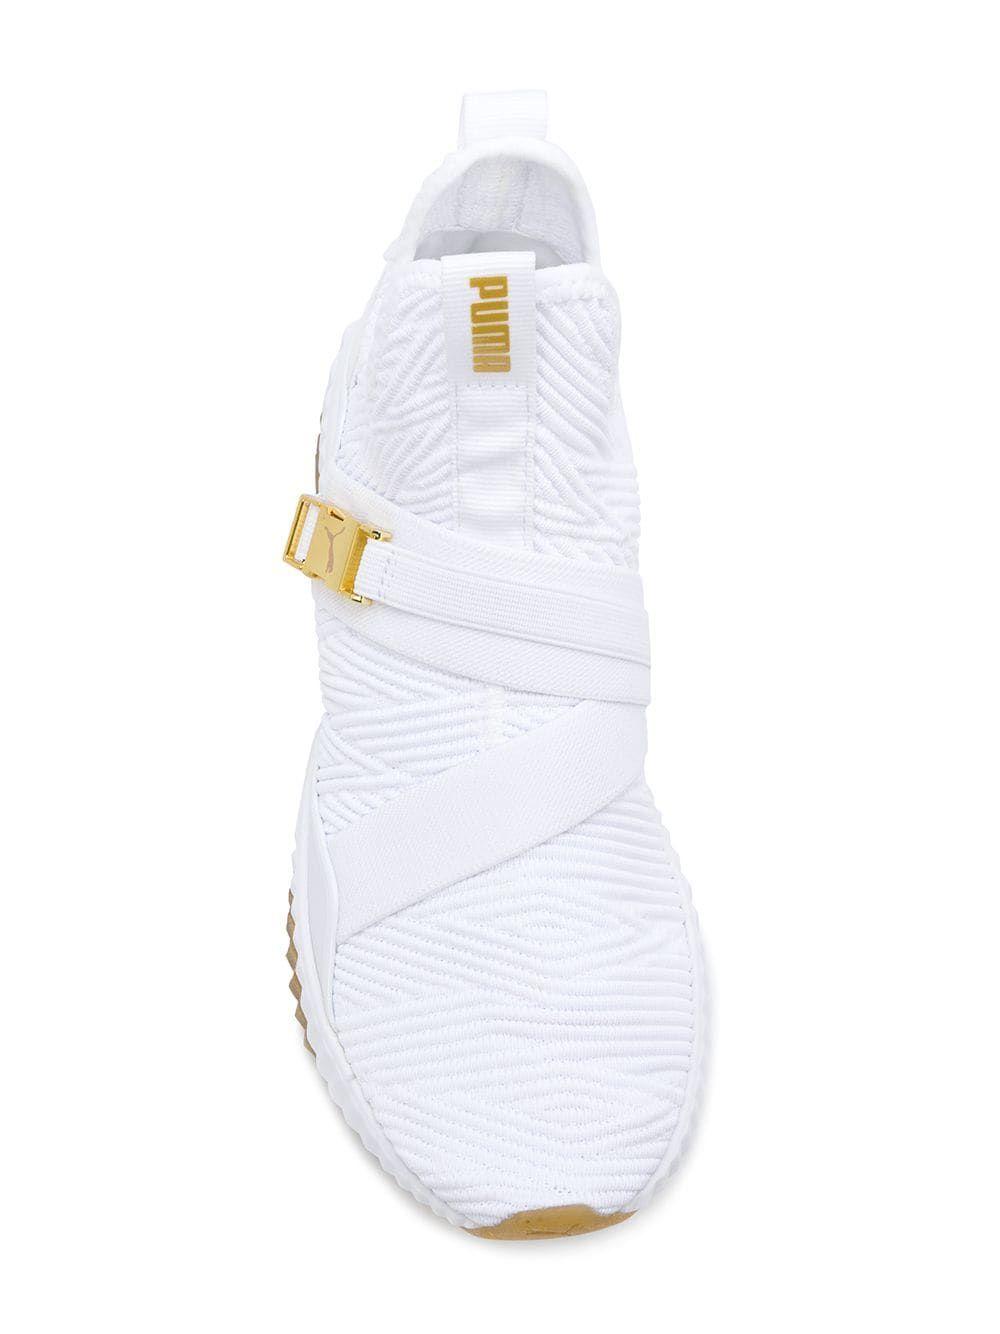 Puma X Selena Gomez Defy Mid Varsity sneakers White Women ...